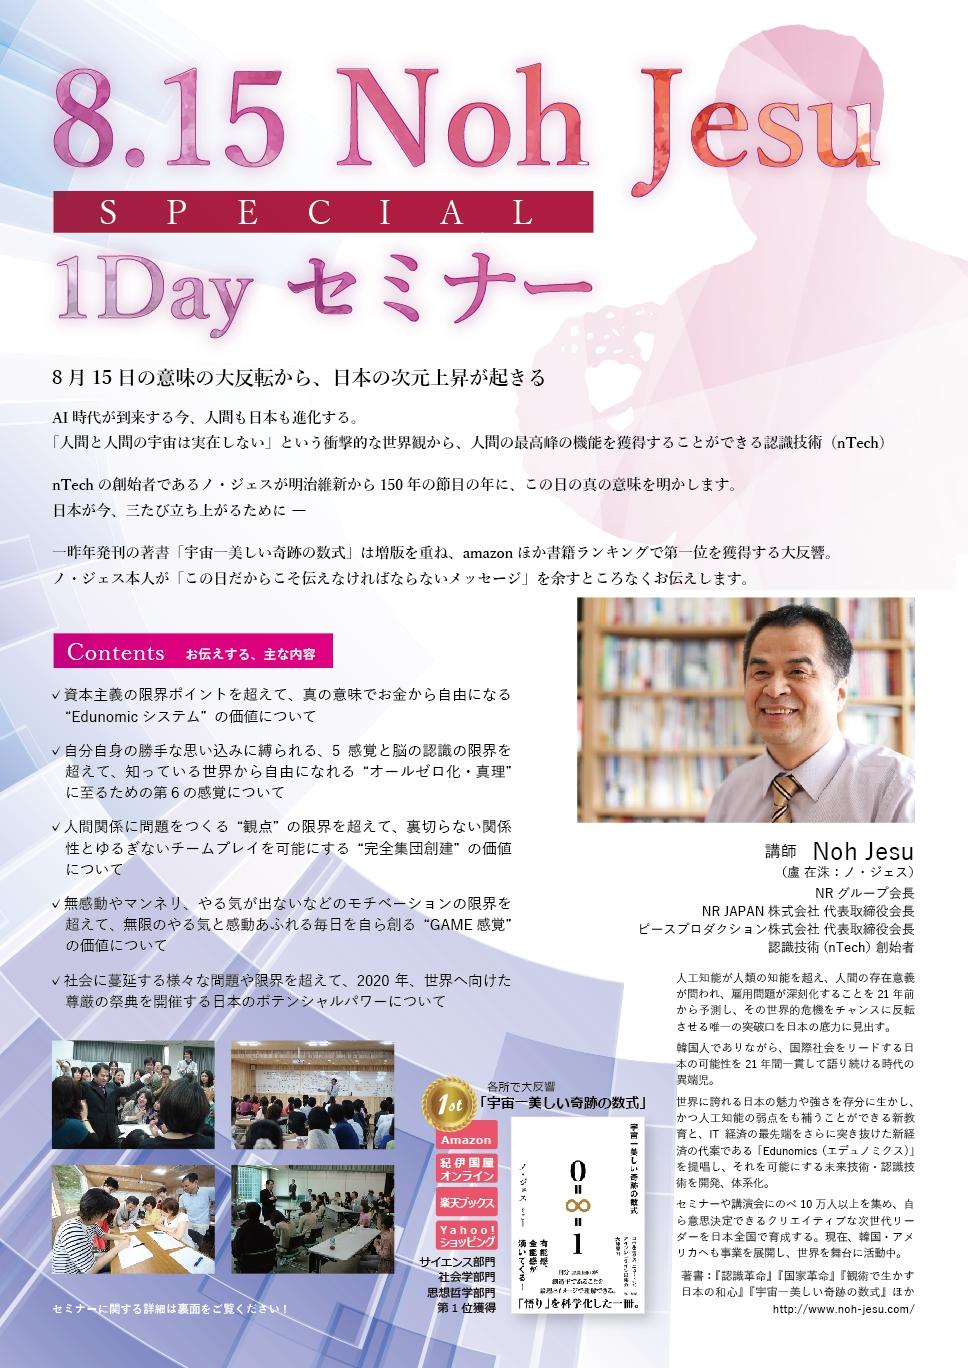 8.15 NohJesuスペシャル1Dayセミナー開催決定! -8月15日の意味の大反転から日本の次元上昇が起きる-